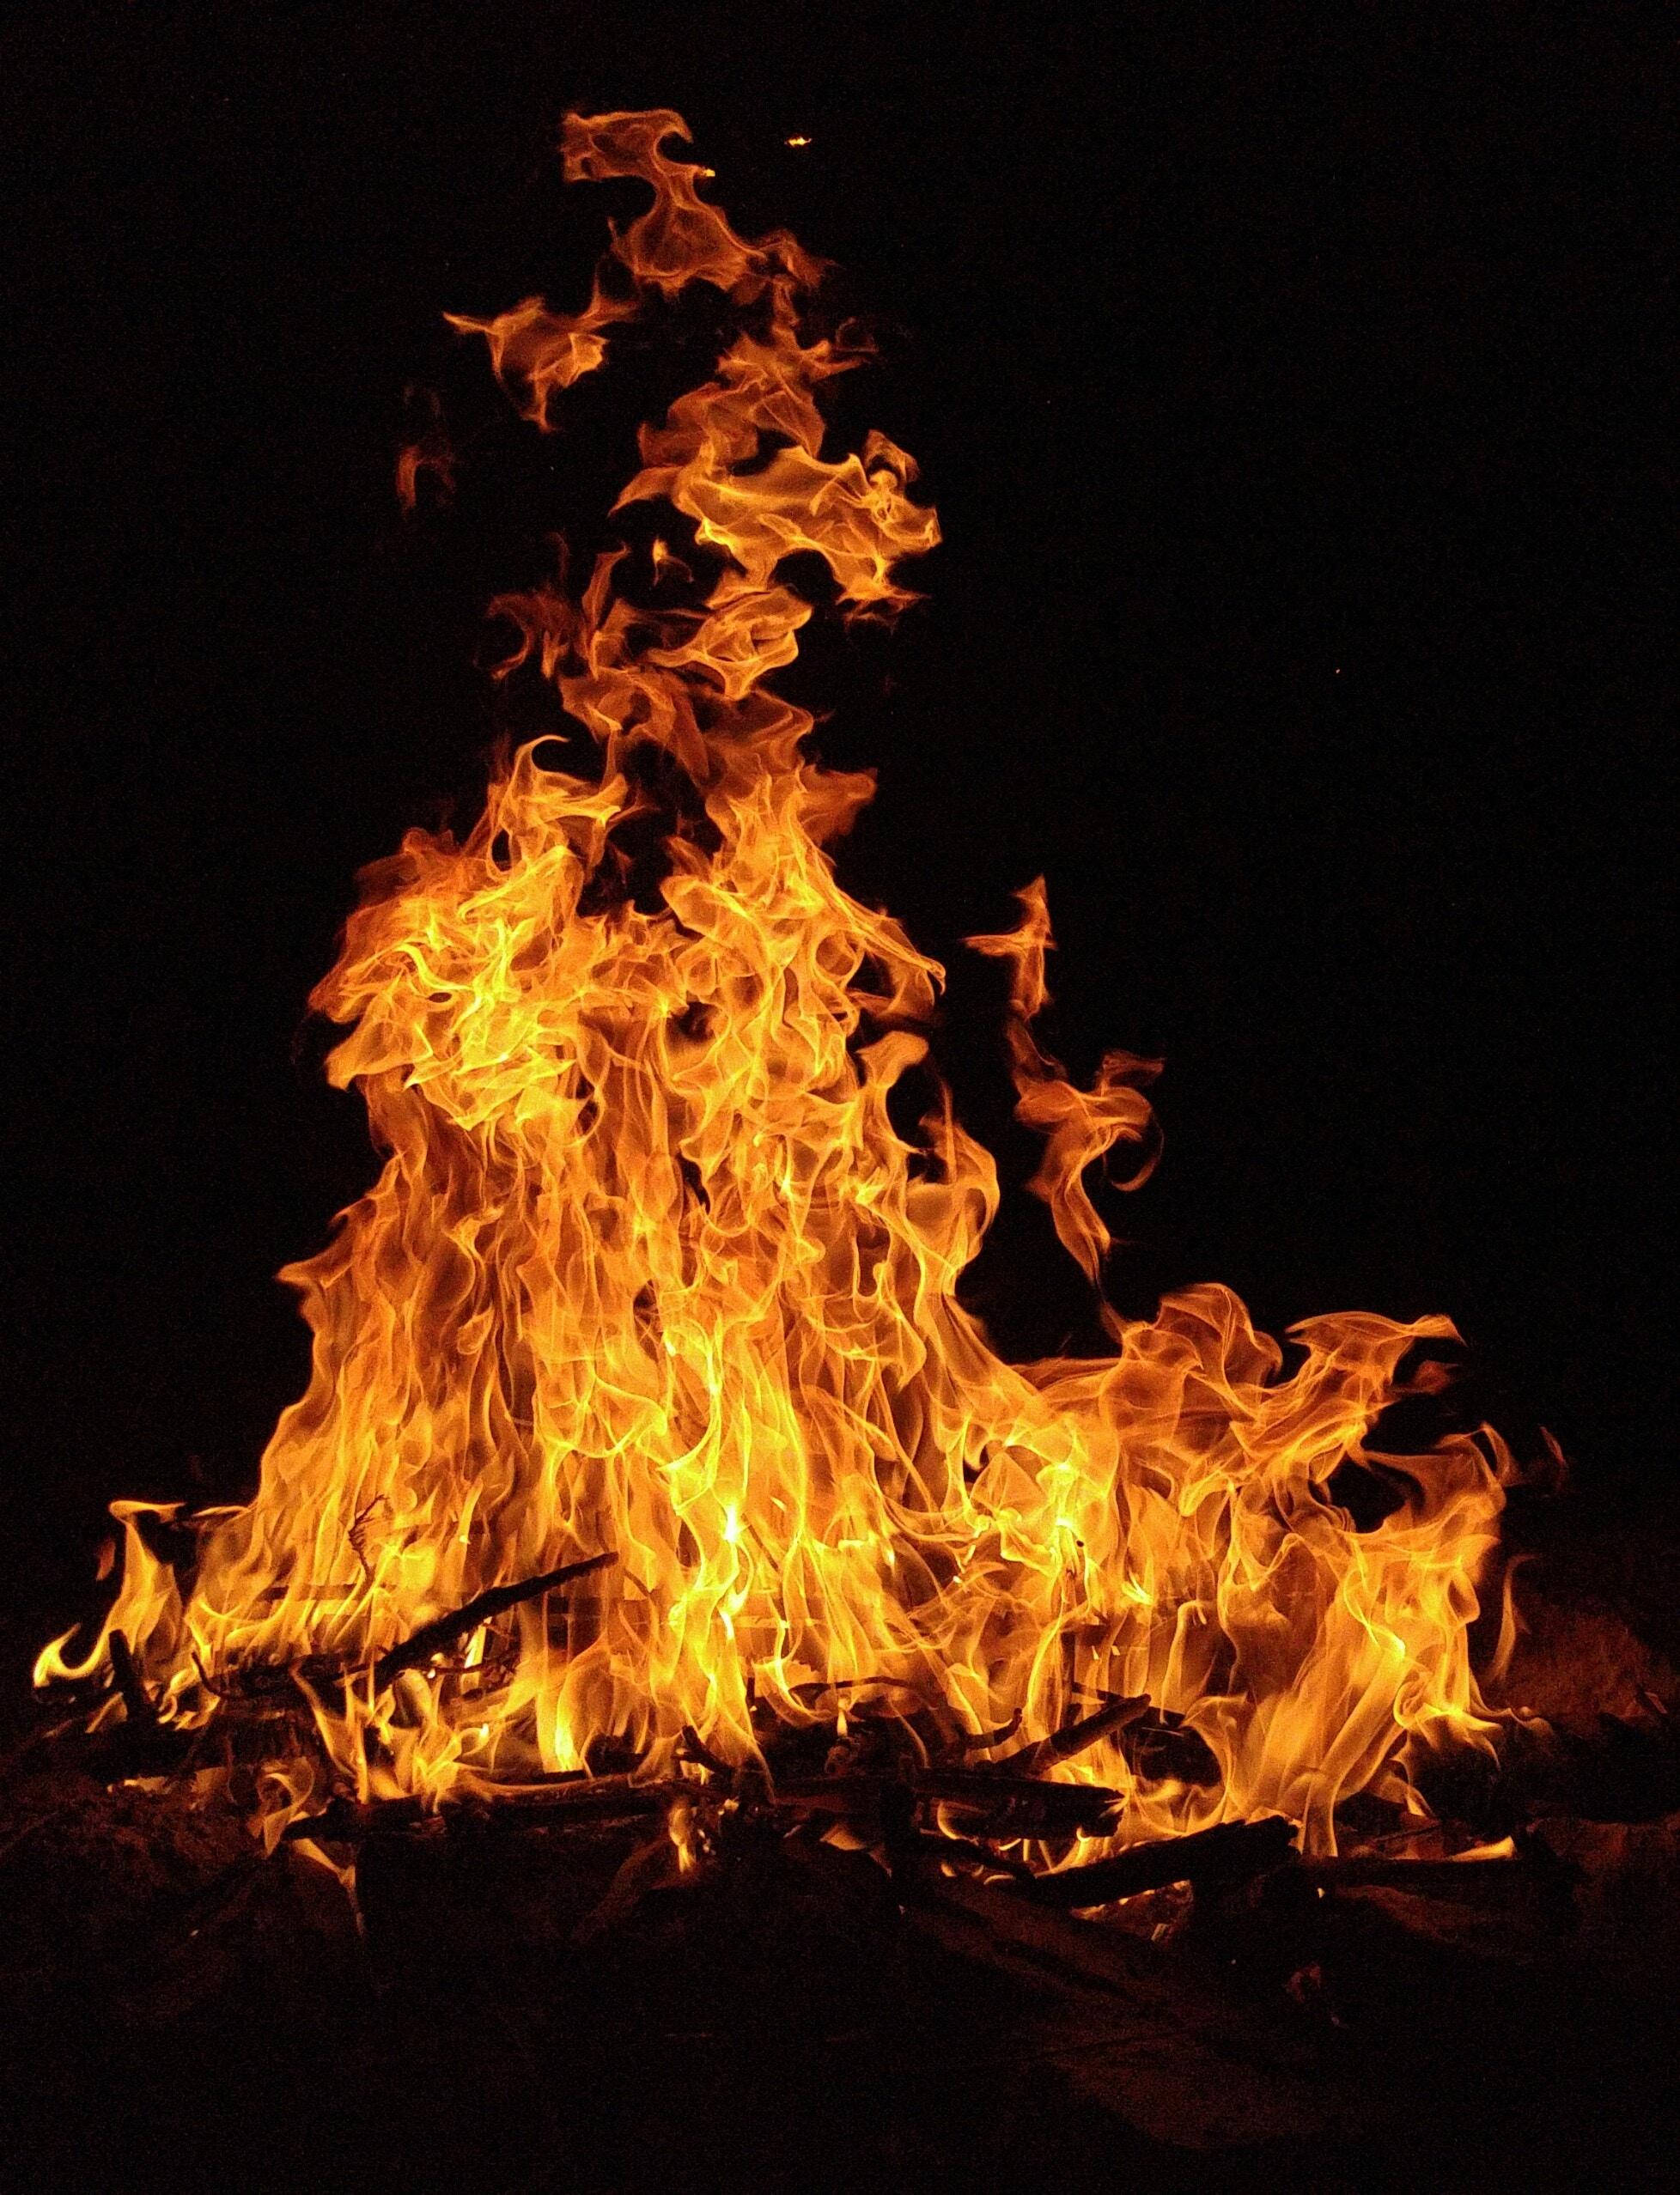 low light photography of bonfire